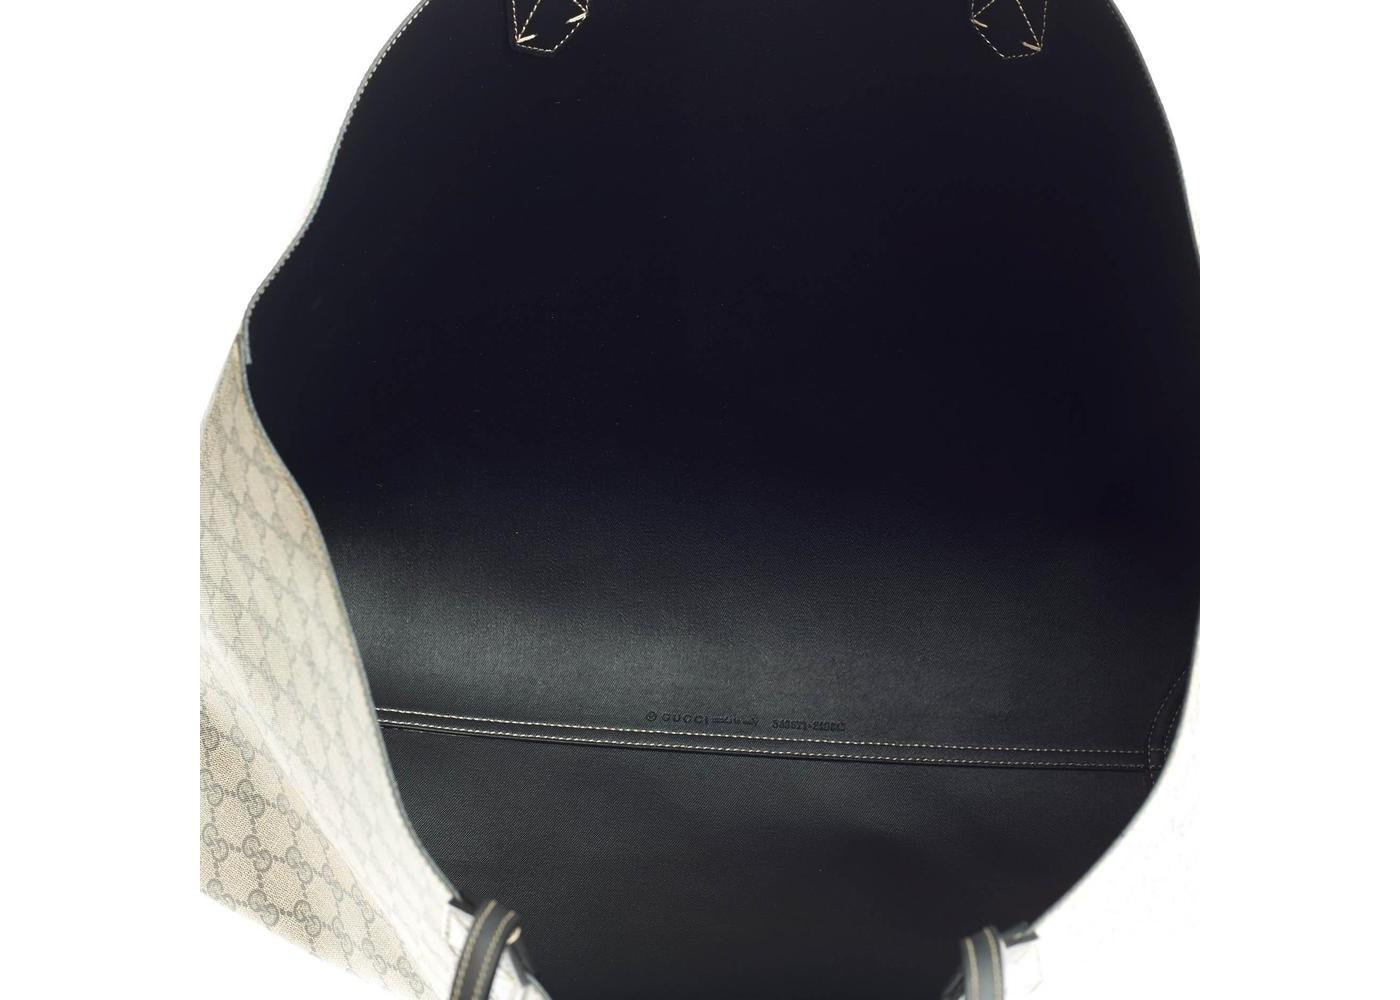 e134fad5d4abb7 Gucci Reversible Tote GG Gucci Logo Embossing Large Black/Beige